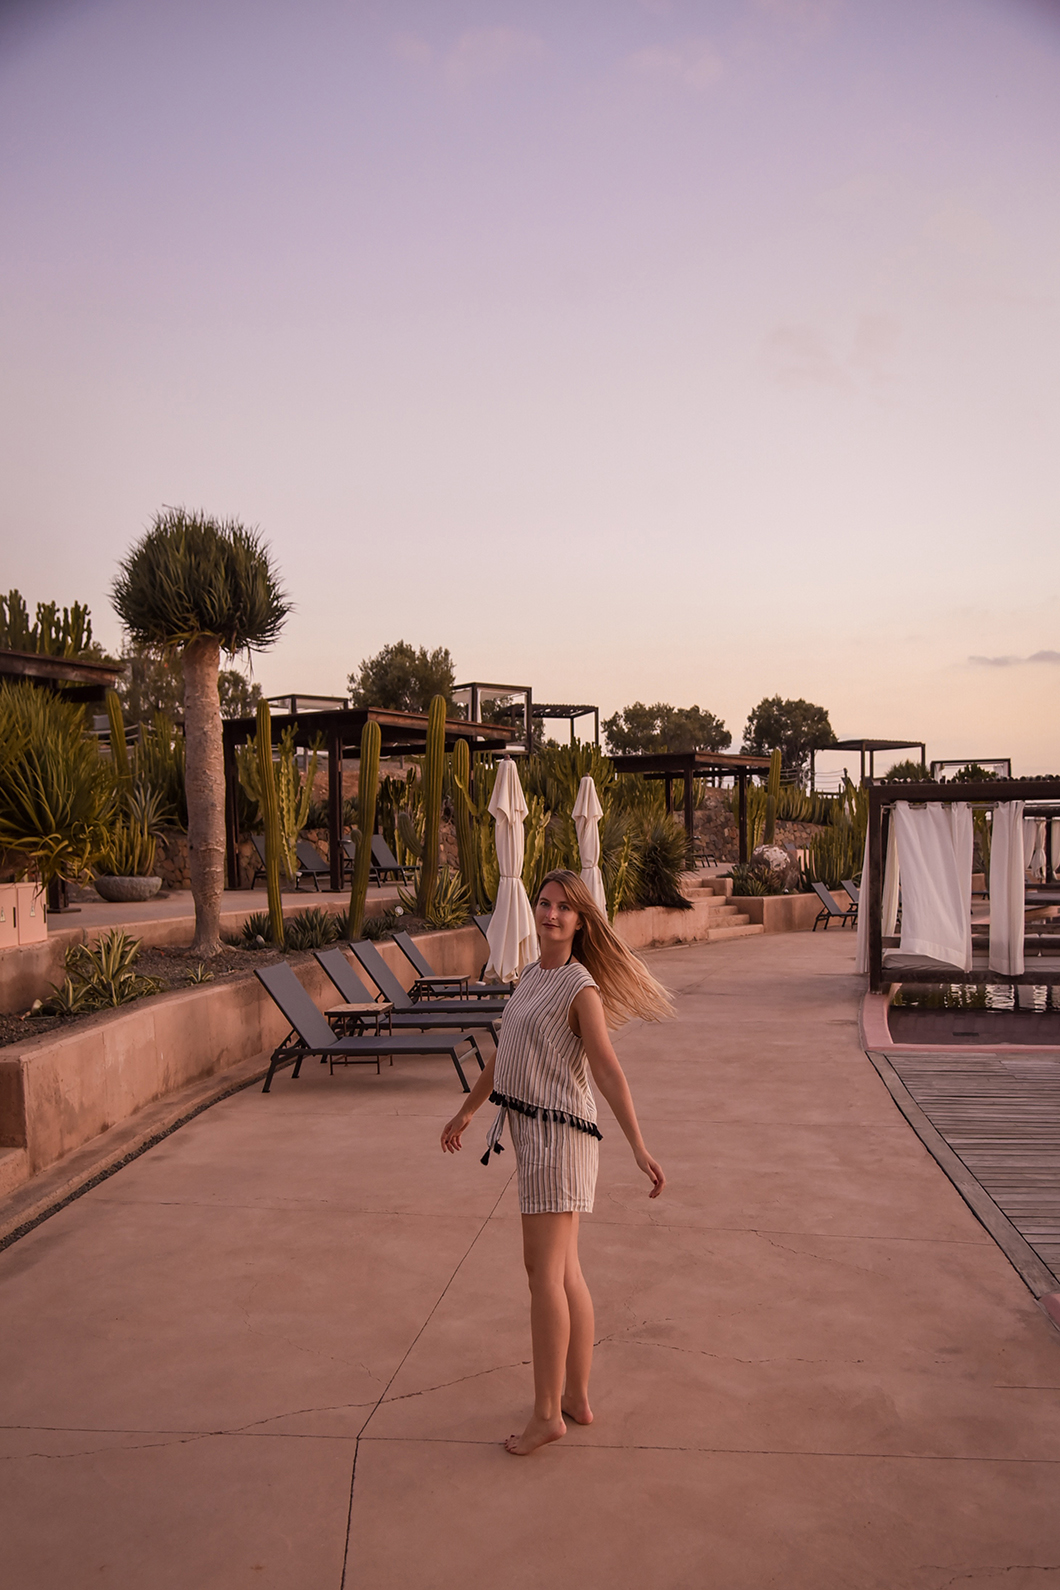 Salobre Hotel Resort & Serenity, hôtel dans le sud de l'île de Grande Canarie